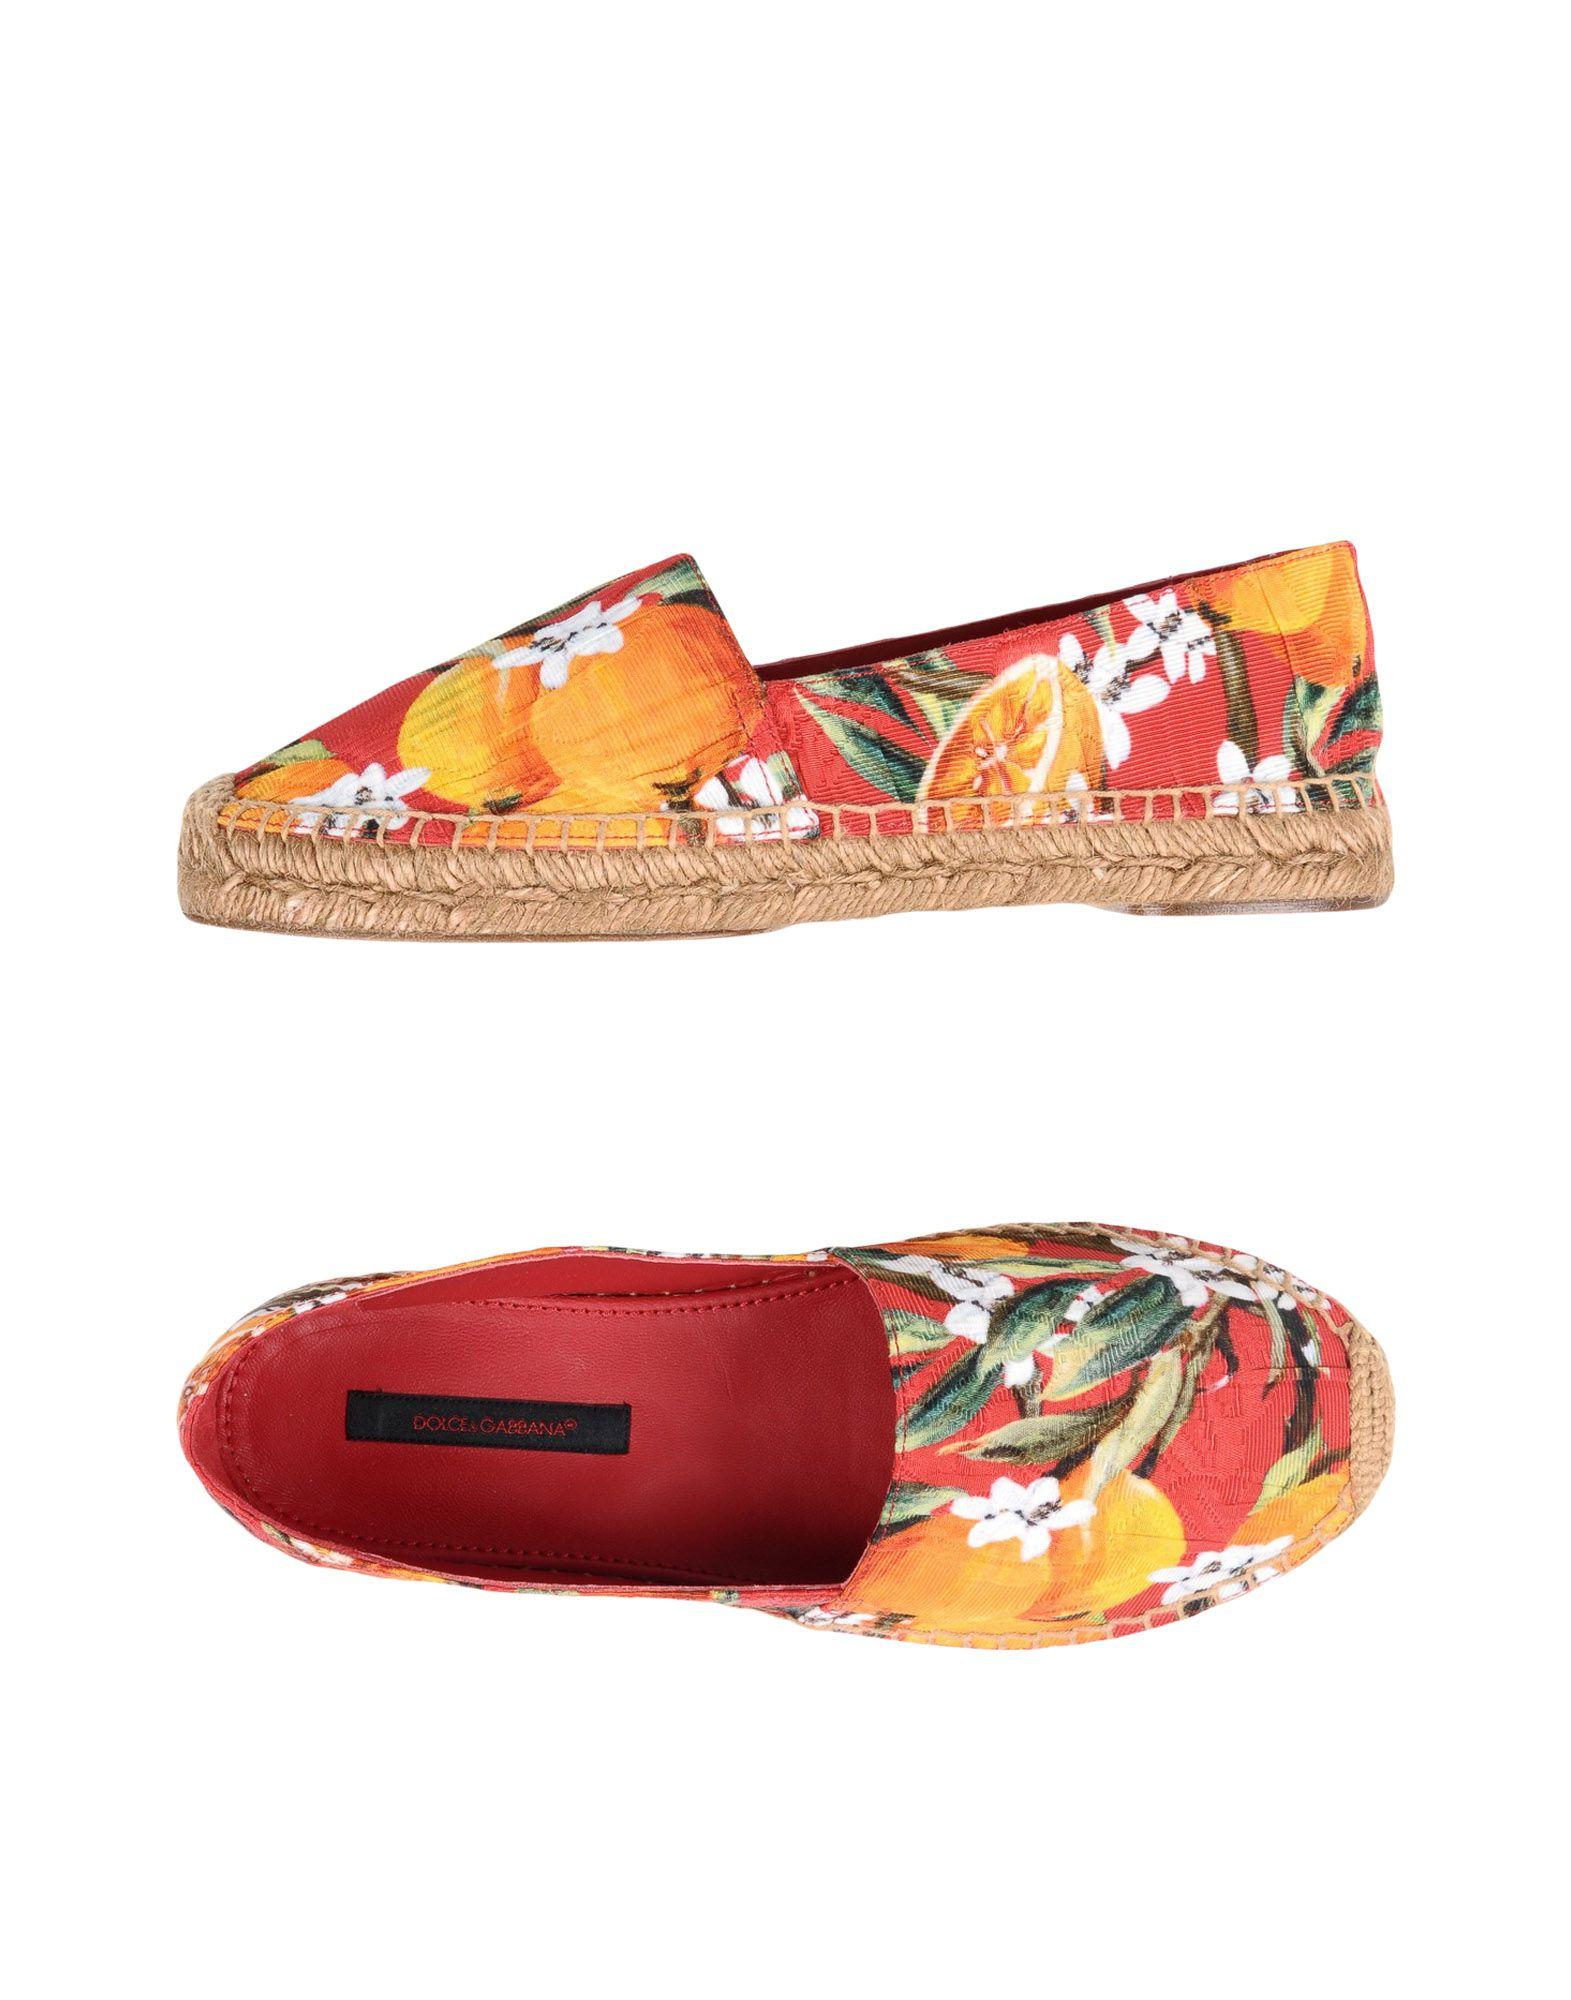 Espadrillas - Dolce & Gabbana Donna - Espadrillas 11508277NI 267f49